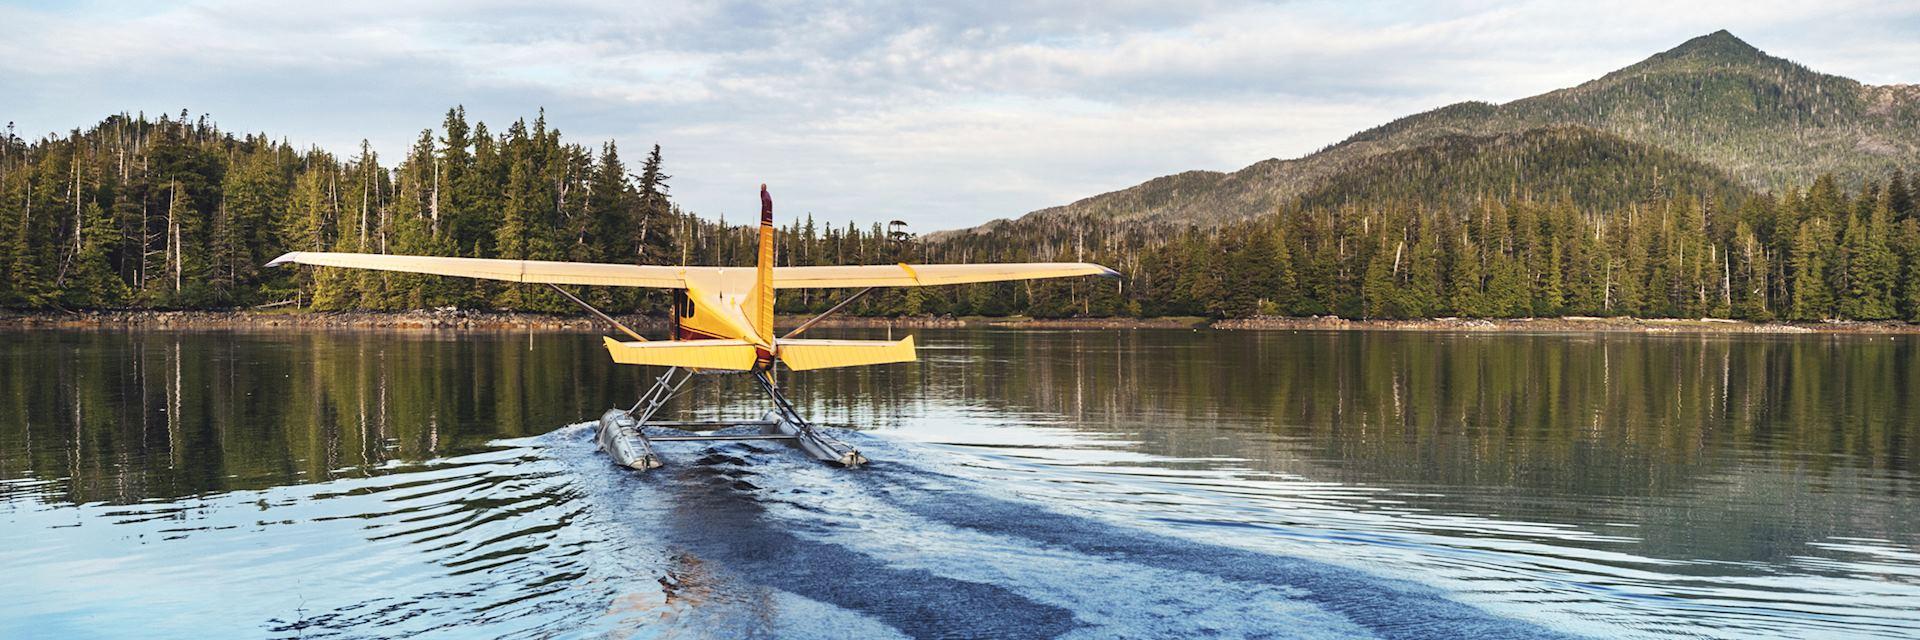 Sea plane sightseeing in Alaska